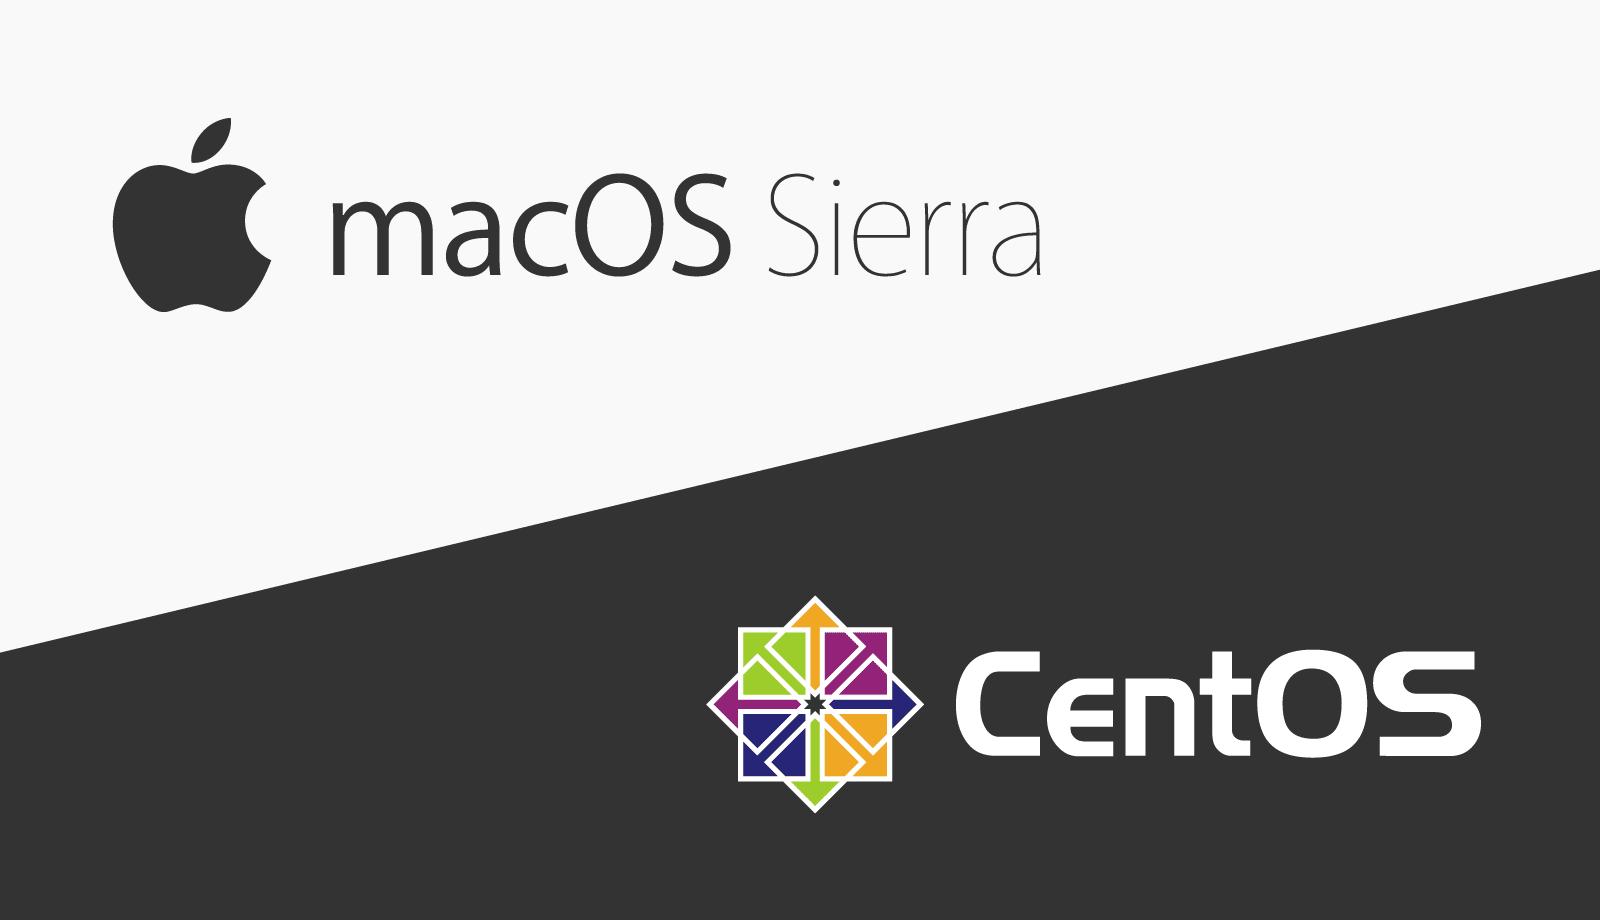 mac OS High SierraにVirtualBox+VagrantでCentOS7仮想環境を構築【#1】 ~ インストールから仮想マシンへの接続まで ~